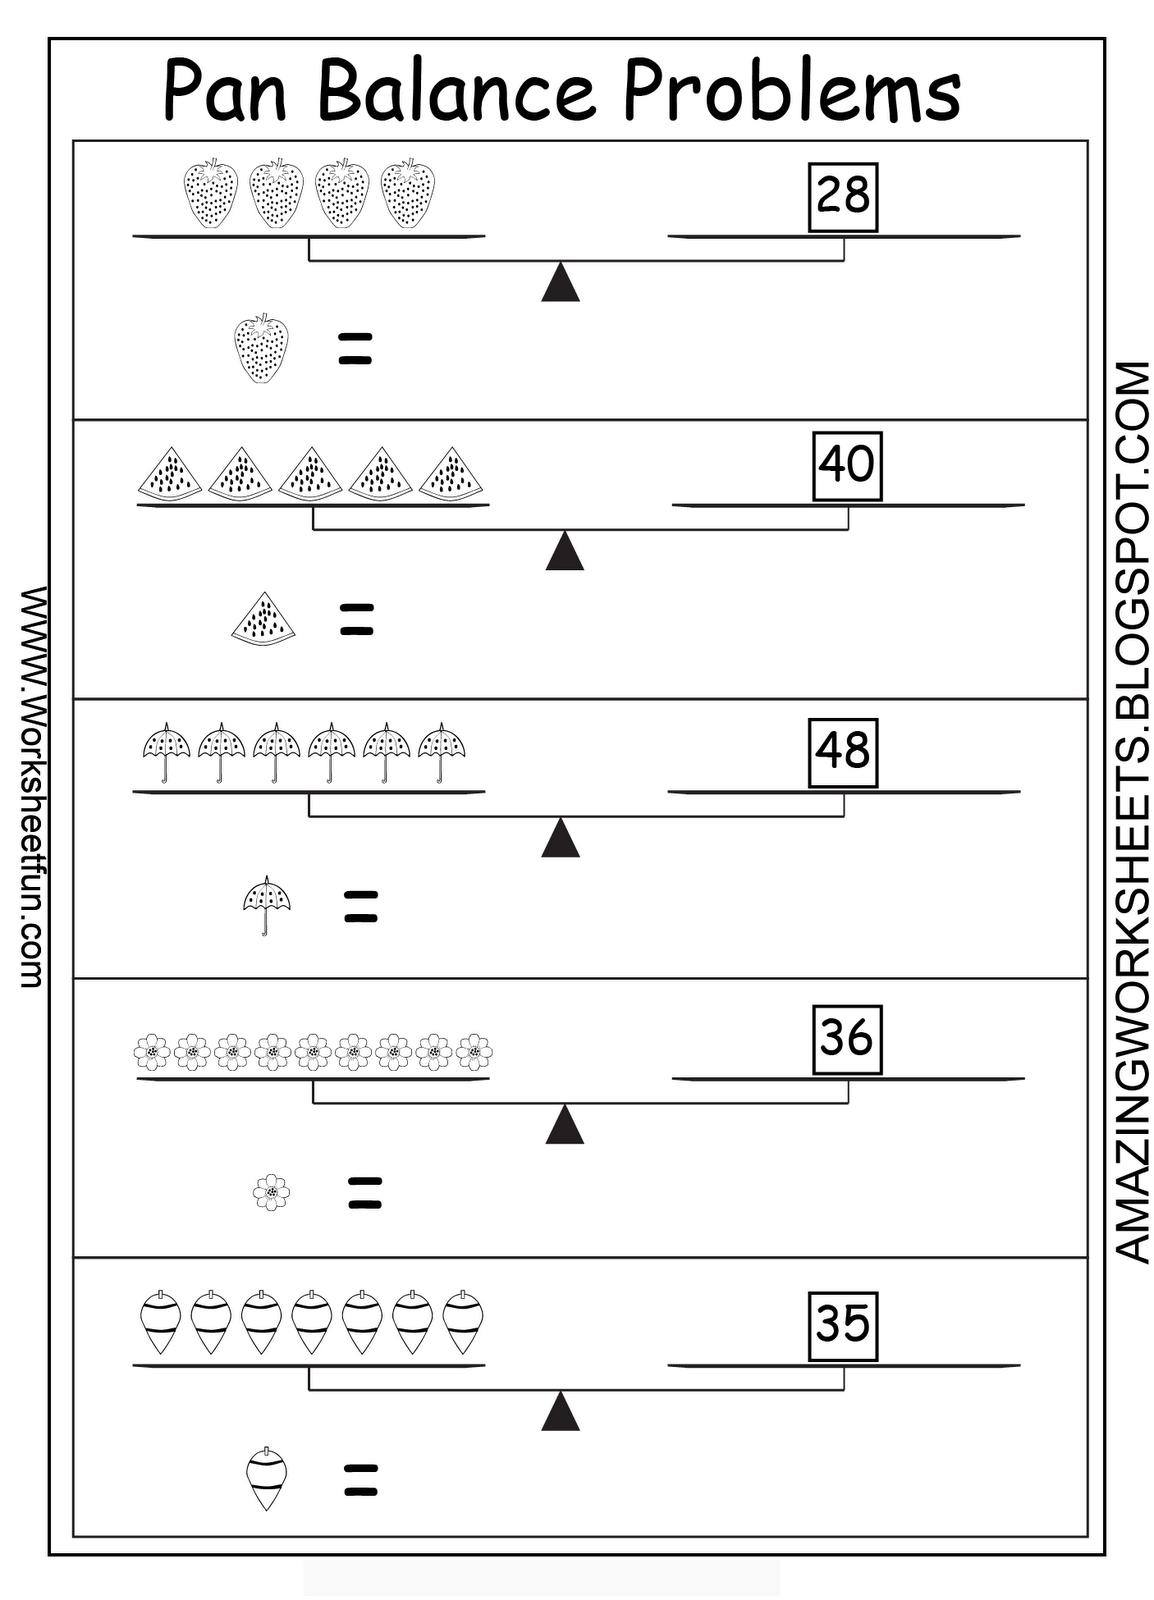 Pan Balance Picture Problems Algebra